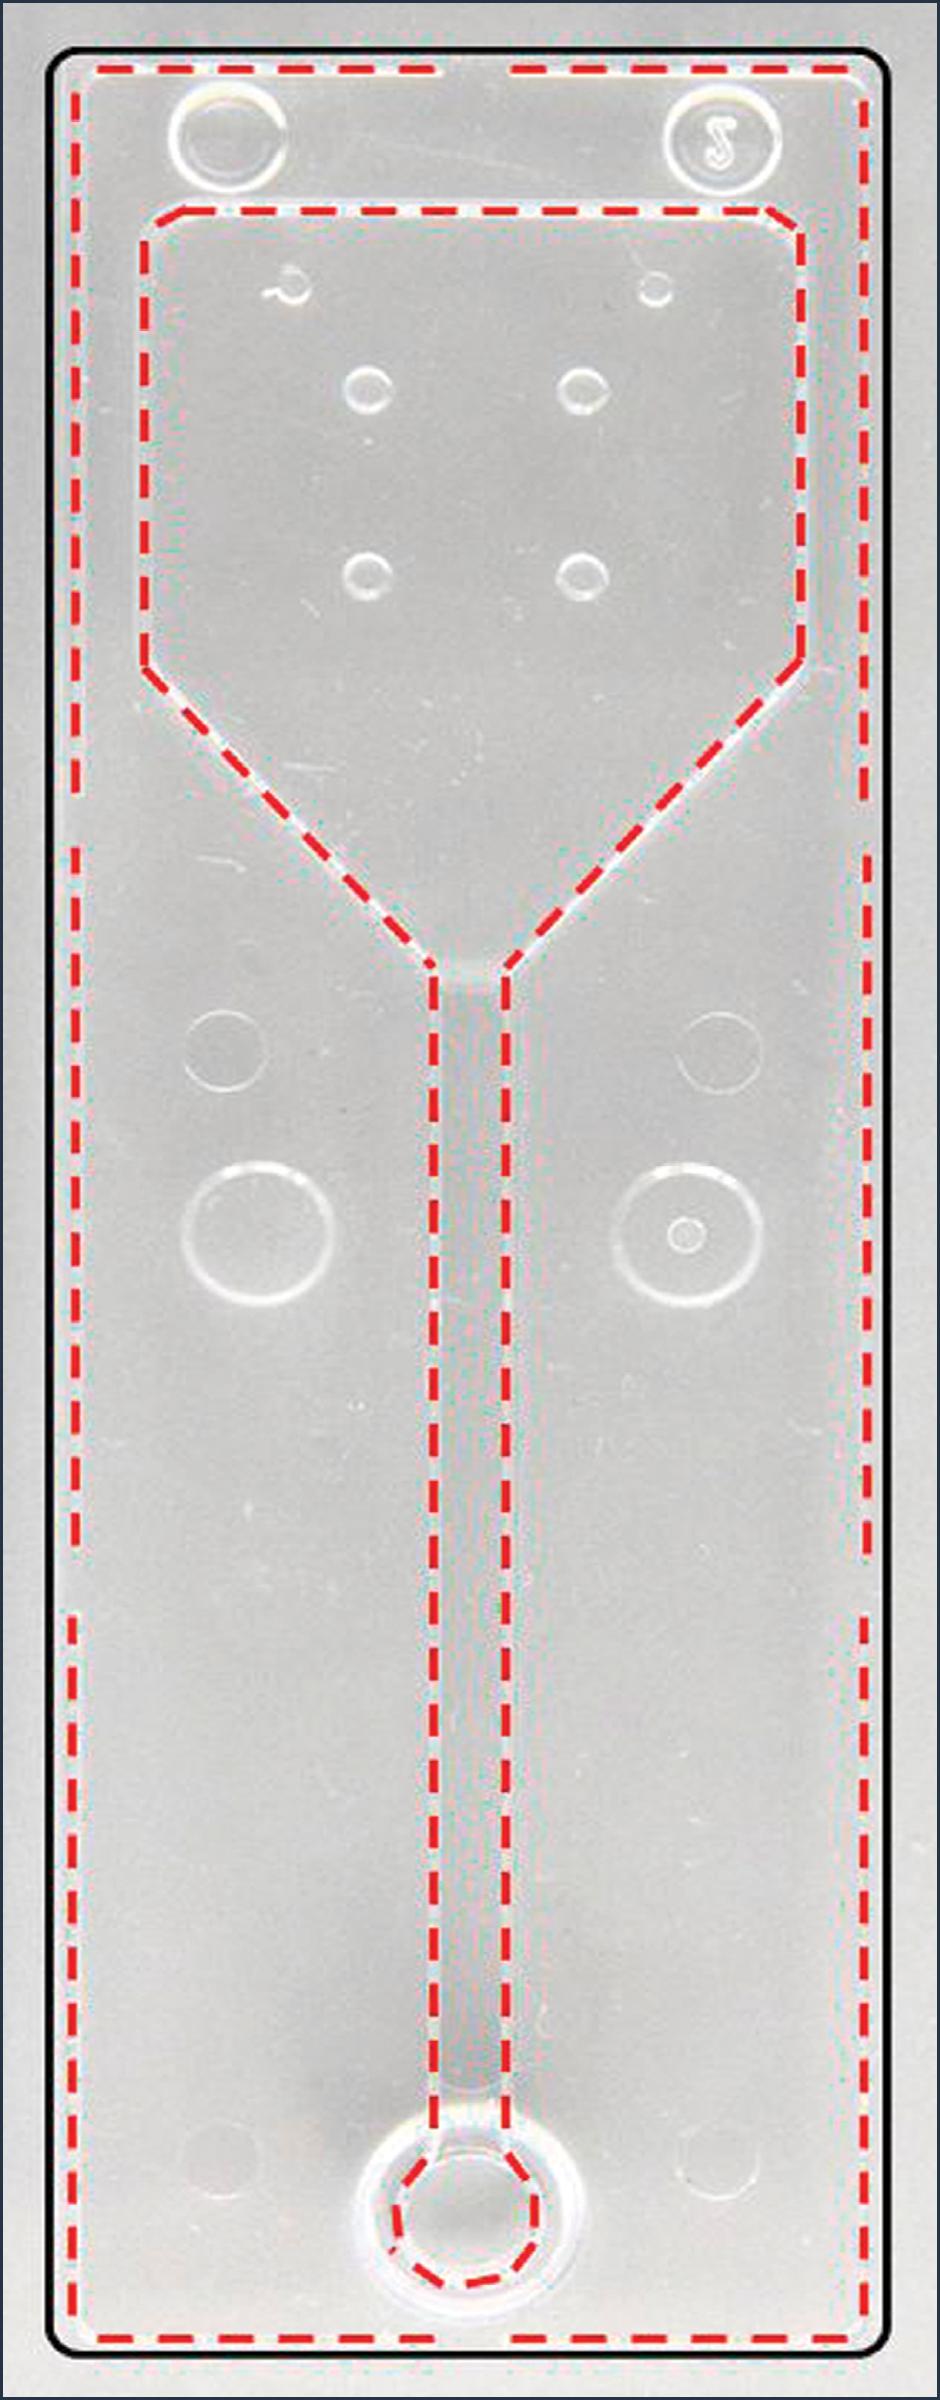 Ultrasonic Welding For Medical Part Assembly Diagram